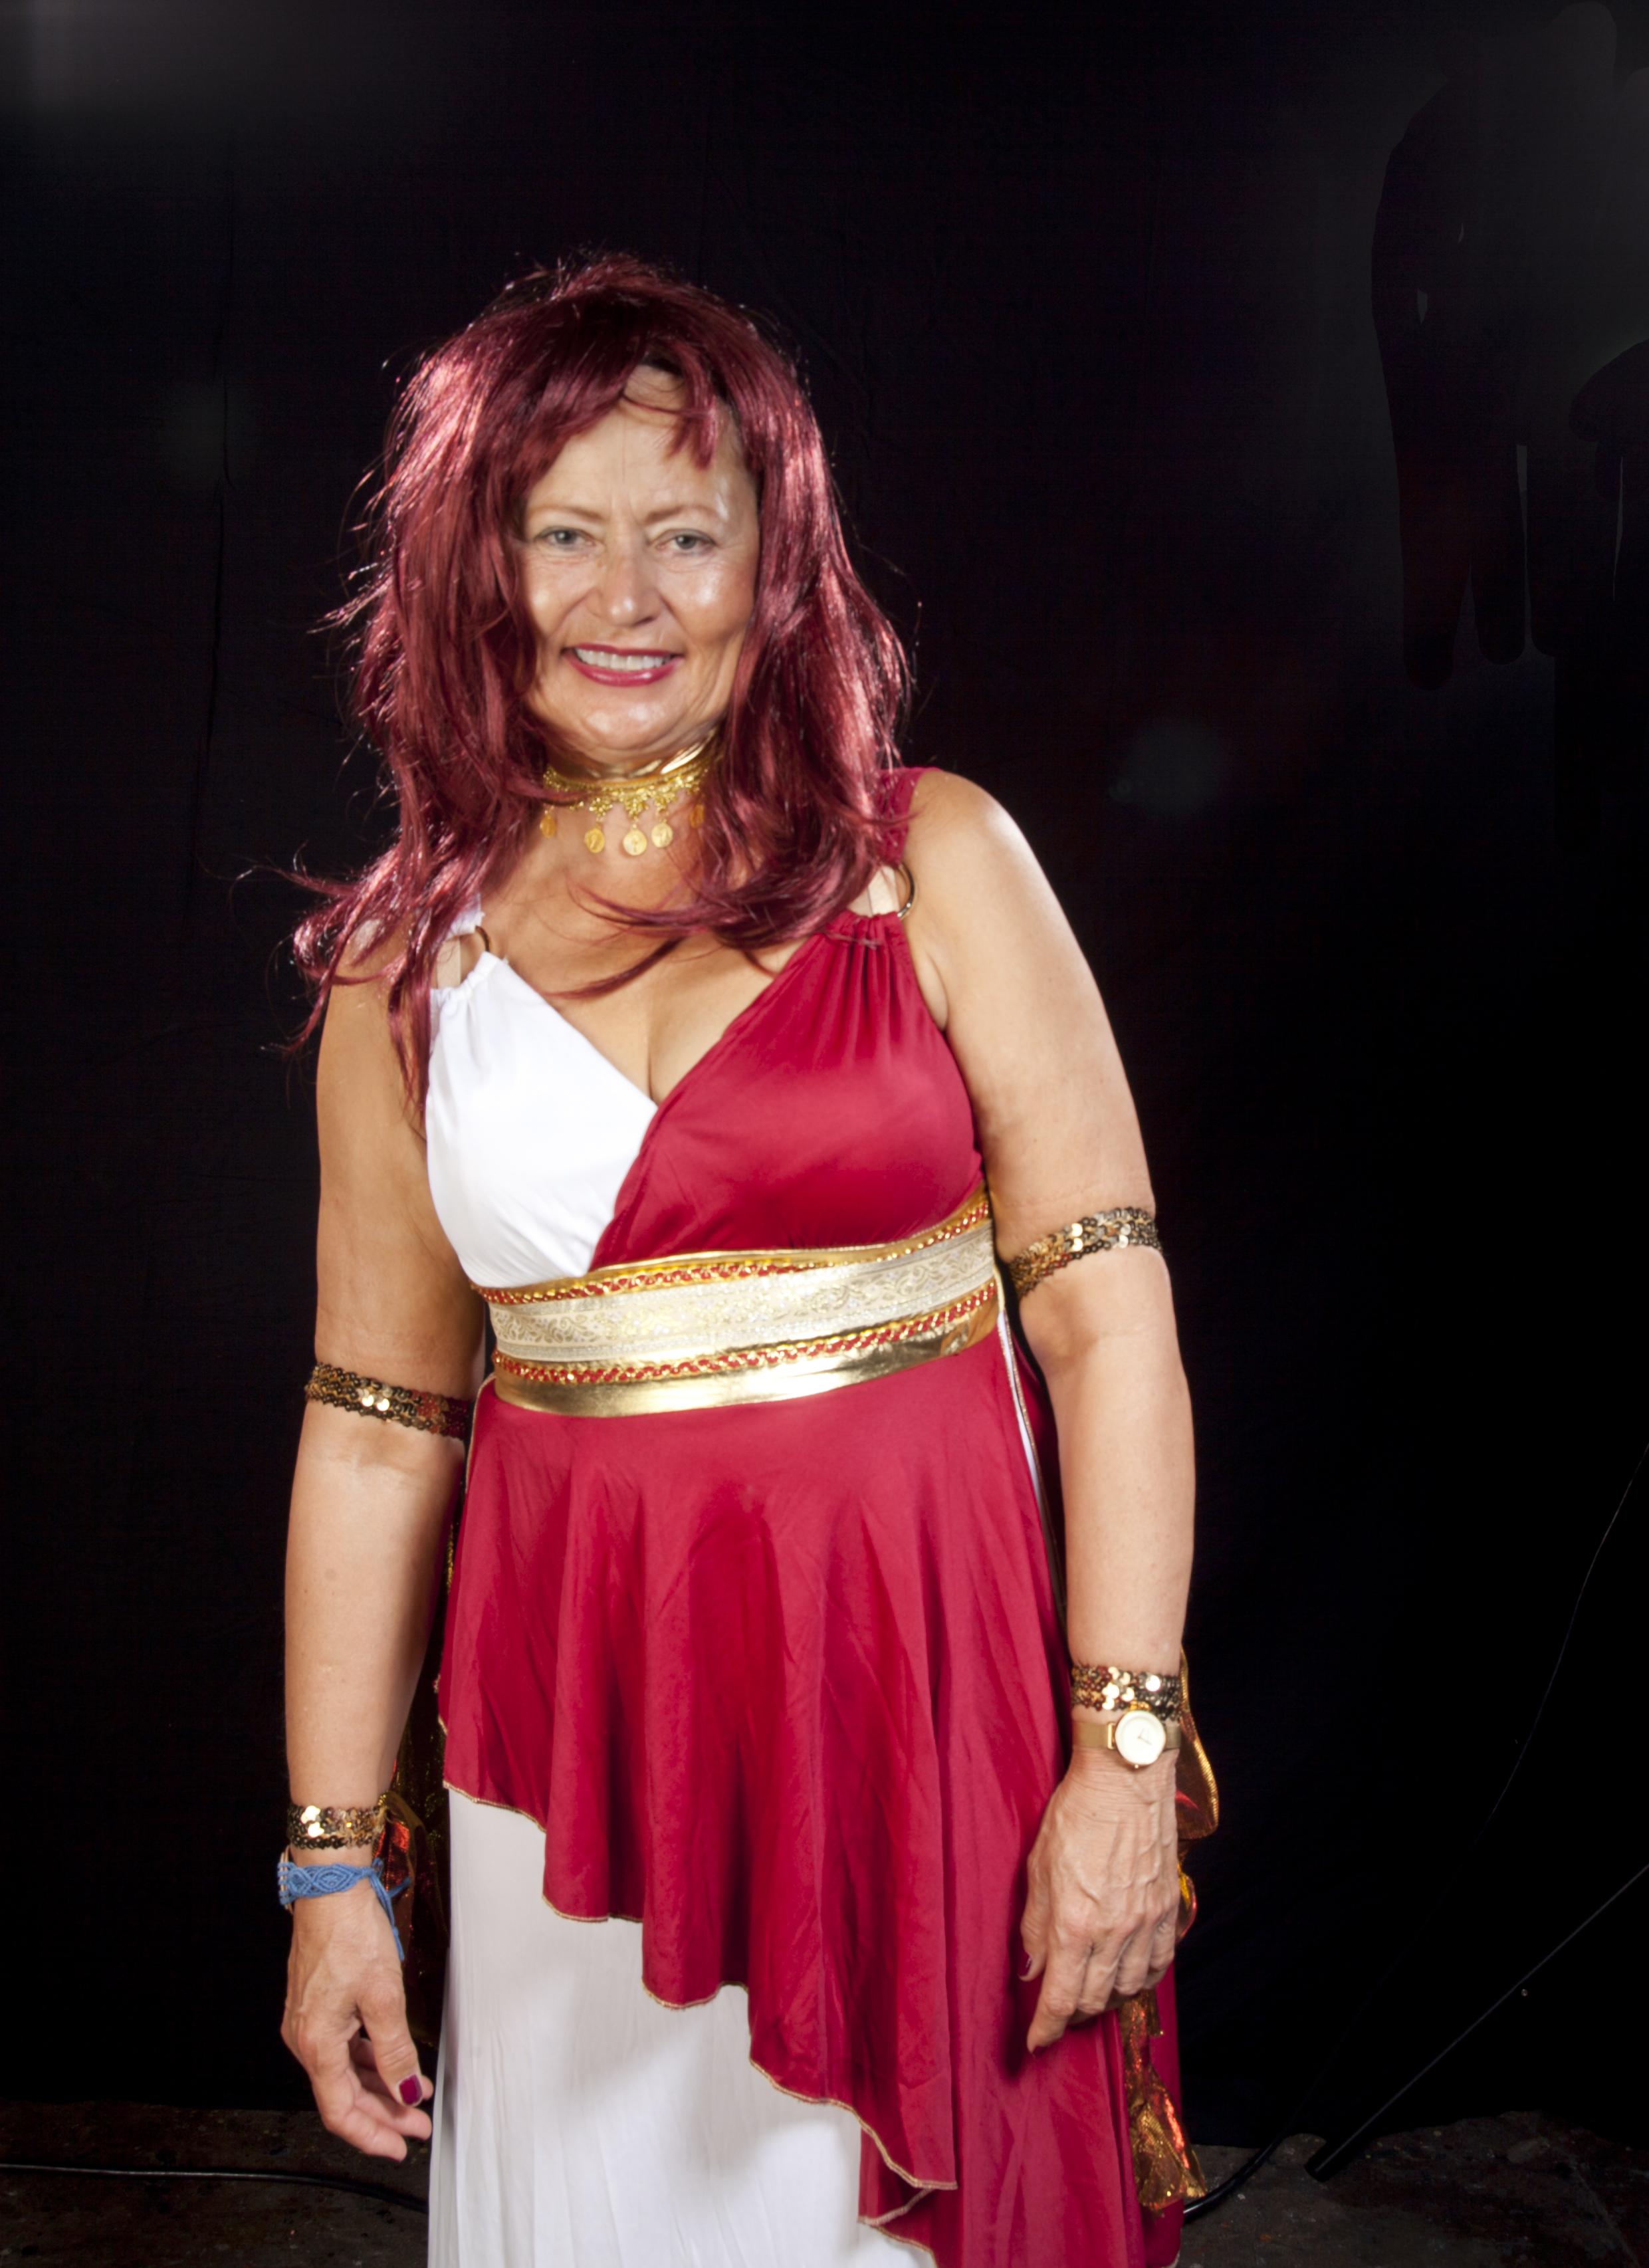 Red hair, grecian dressIMG_4458.jpg